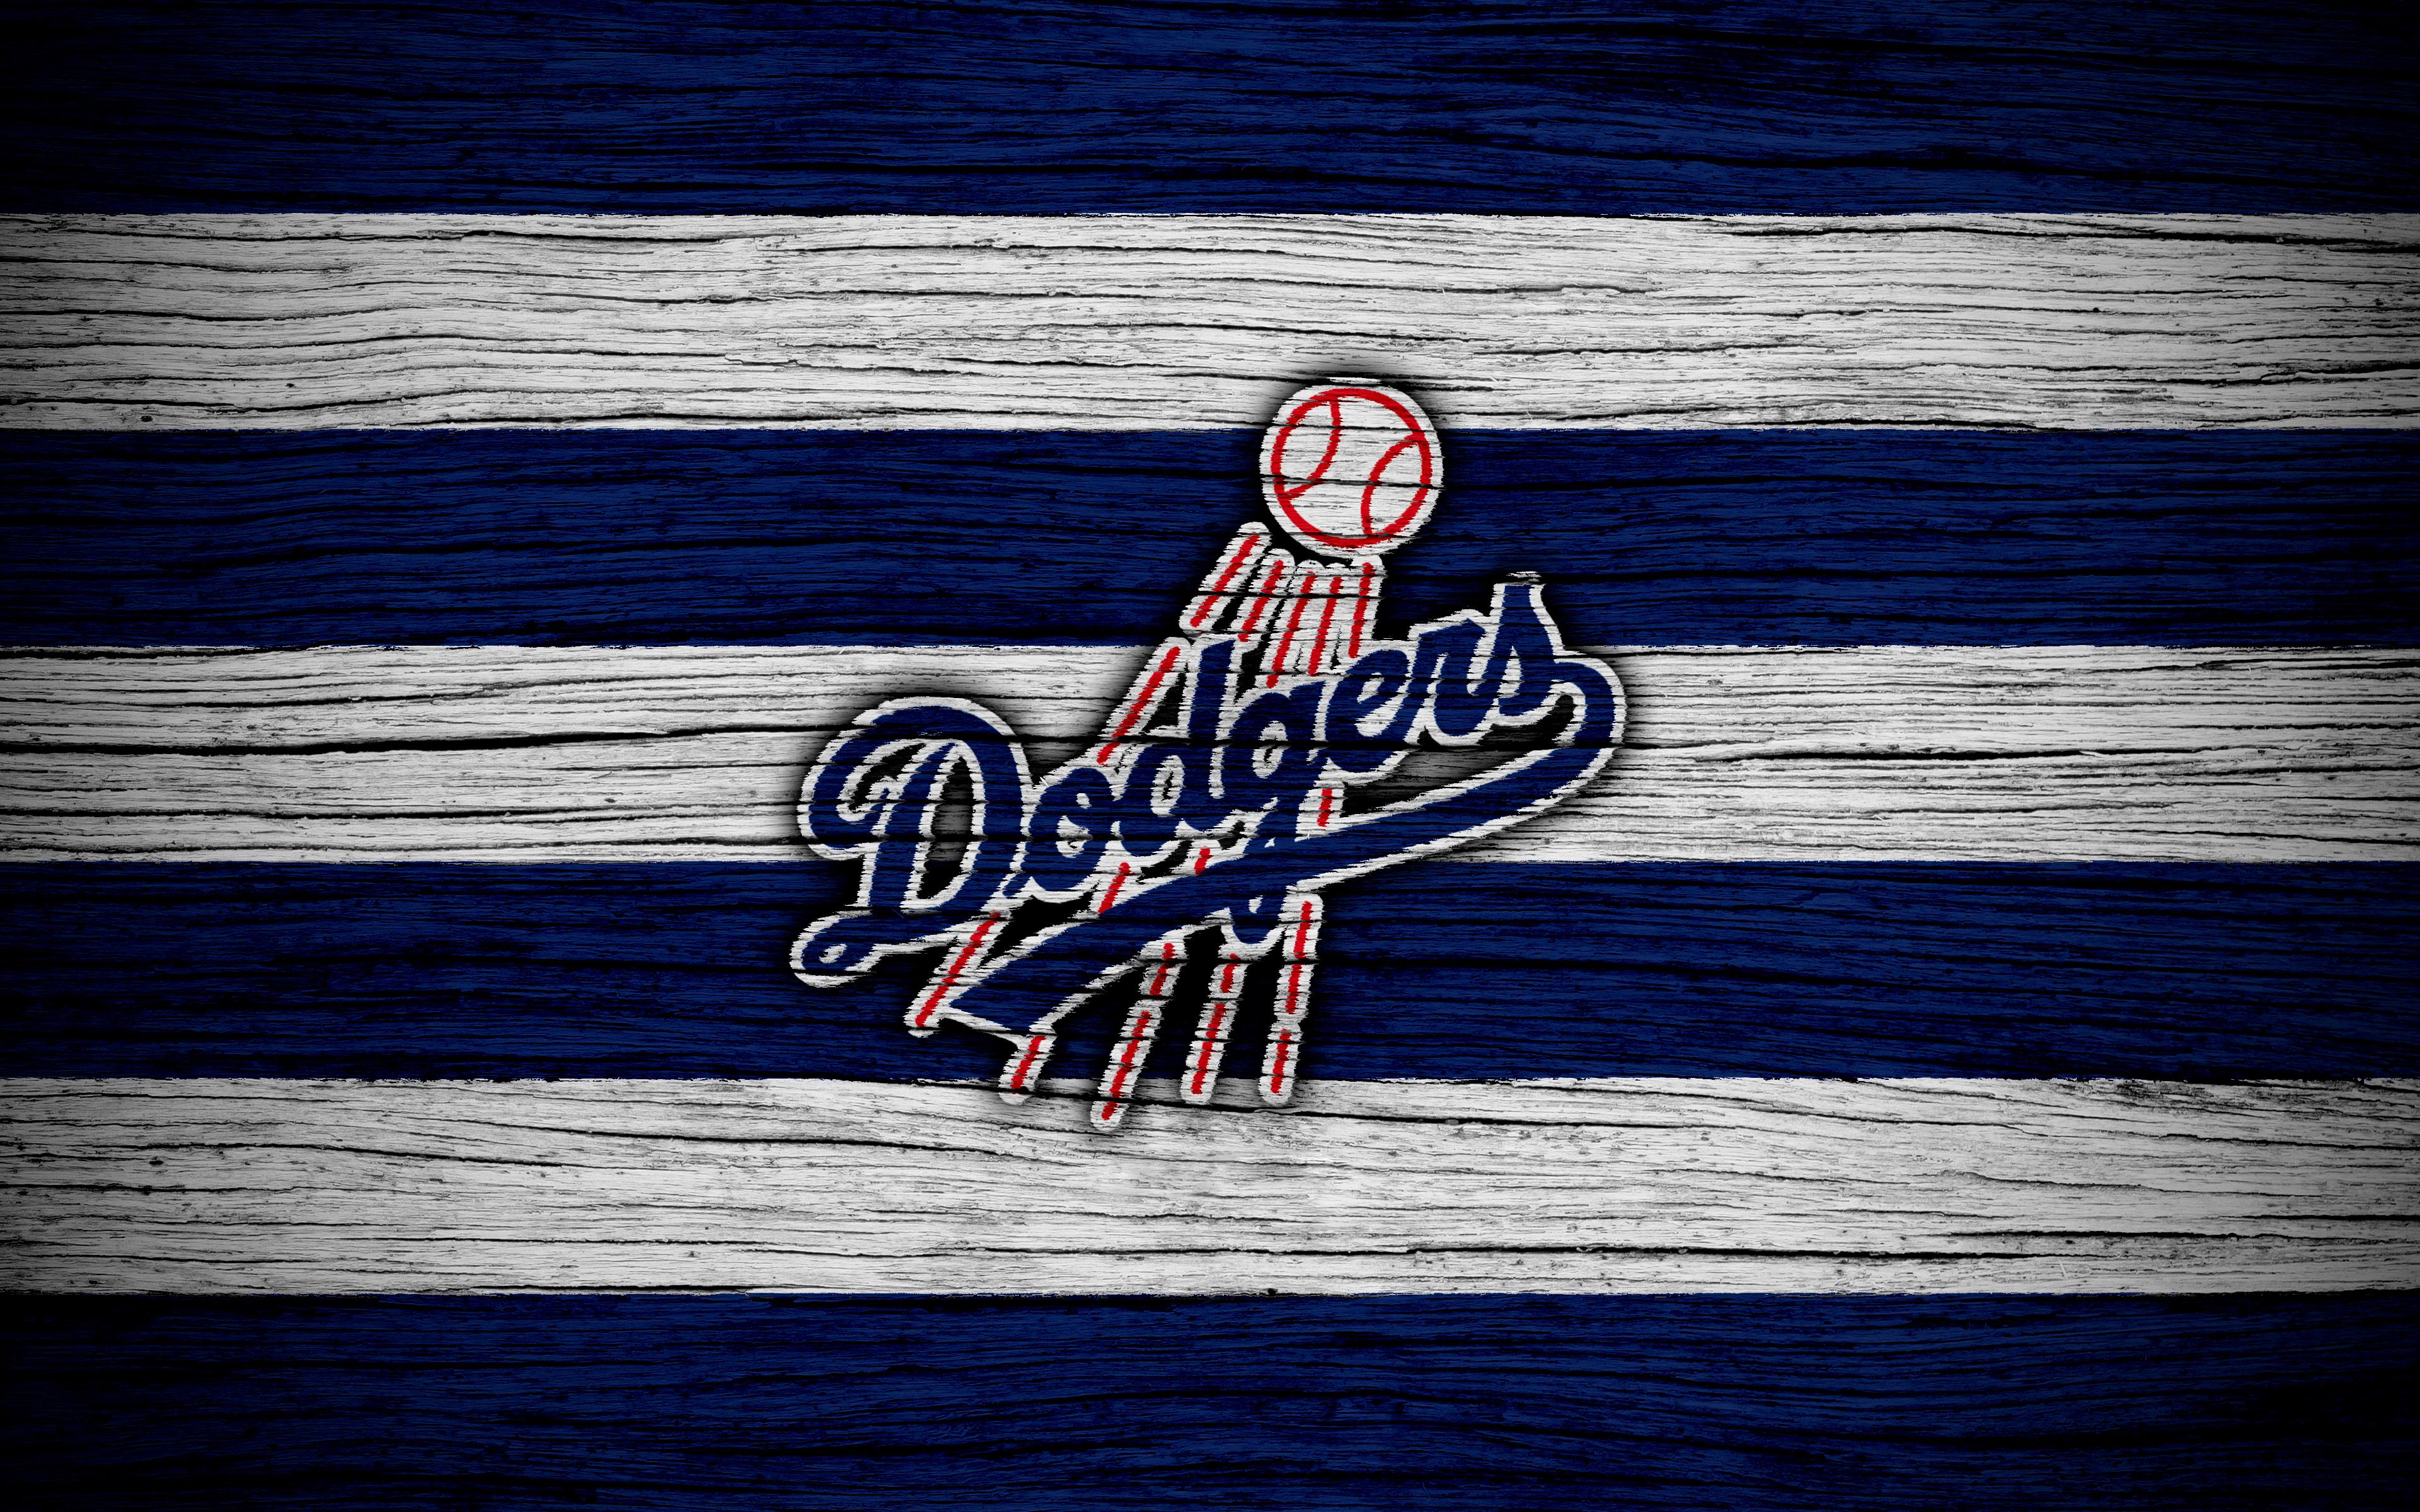 Los Angeles Dodgers 4k Ultra Hd Wallpaper Background Image